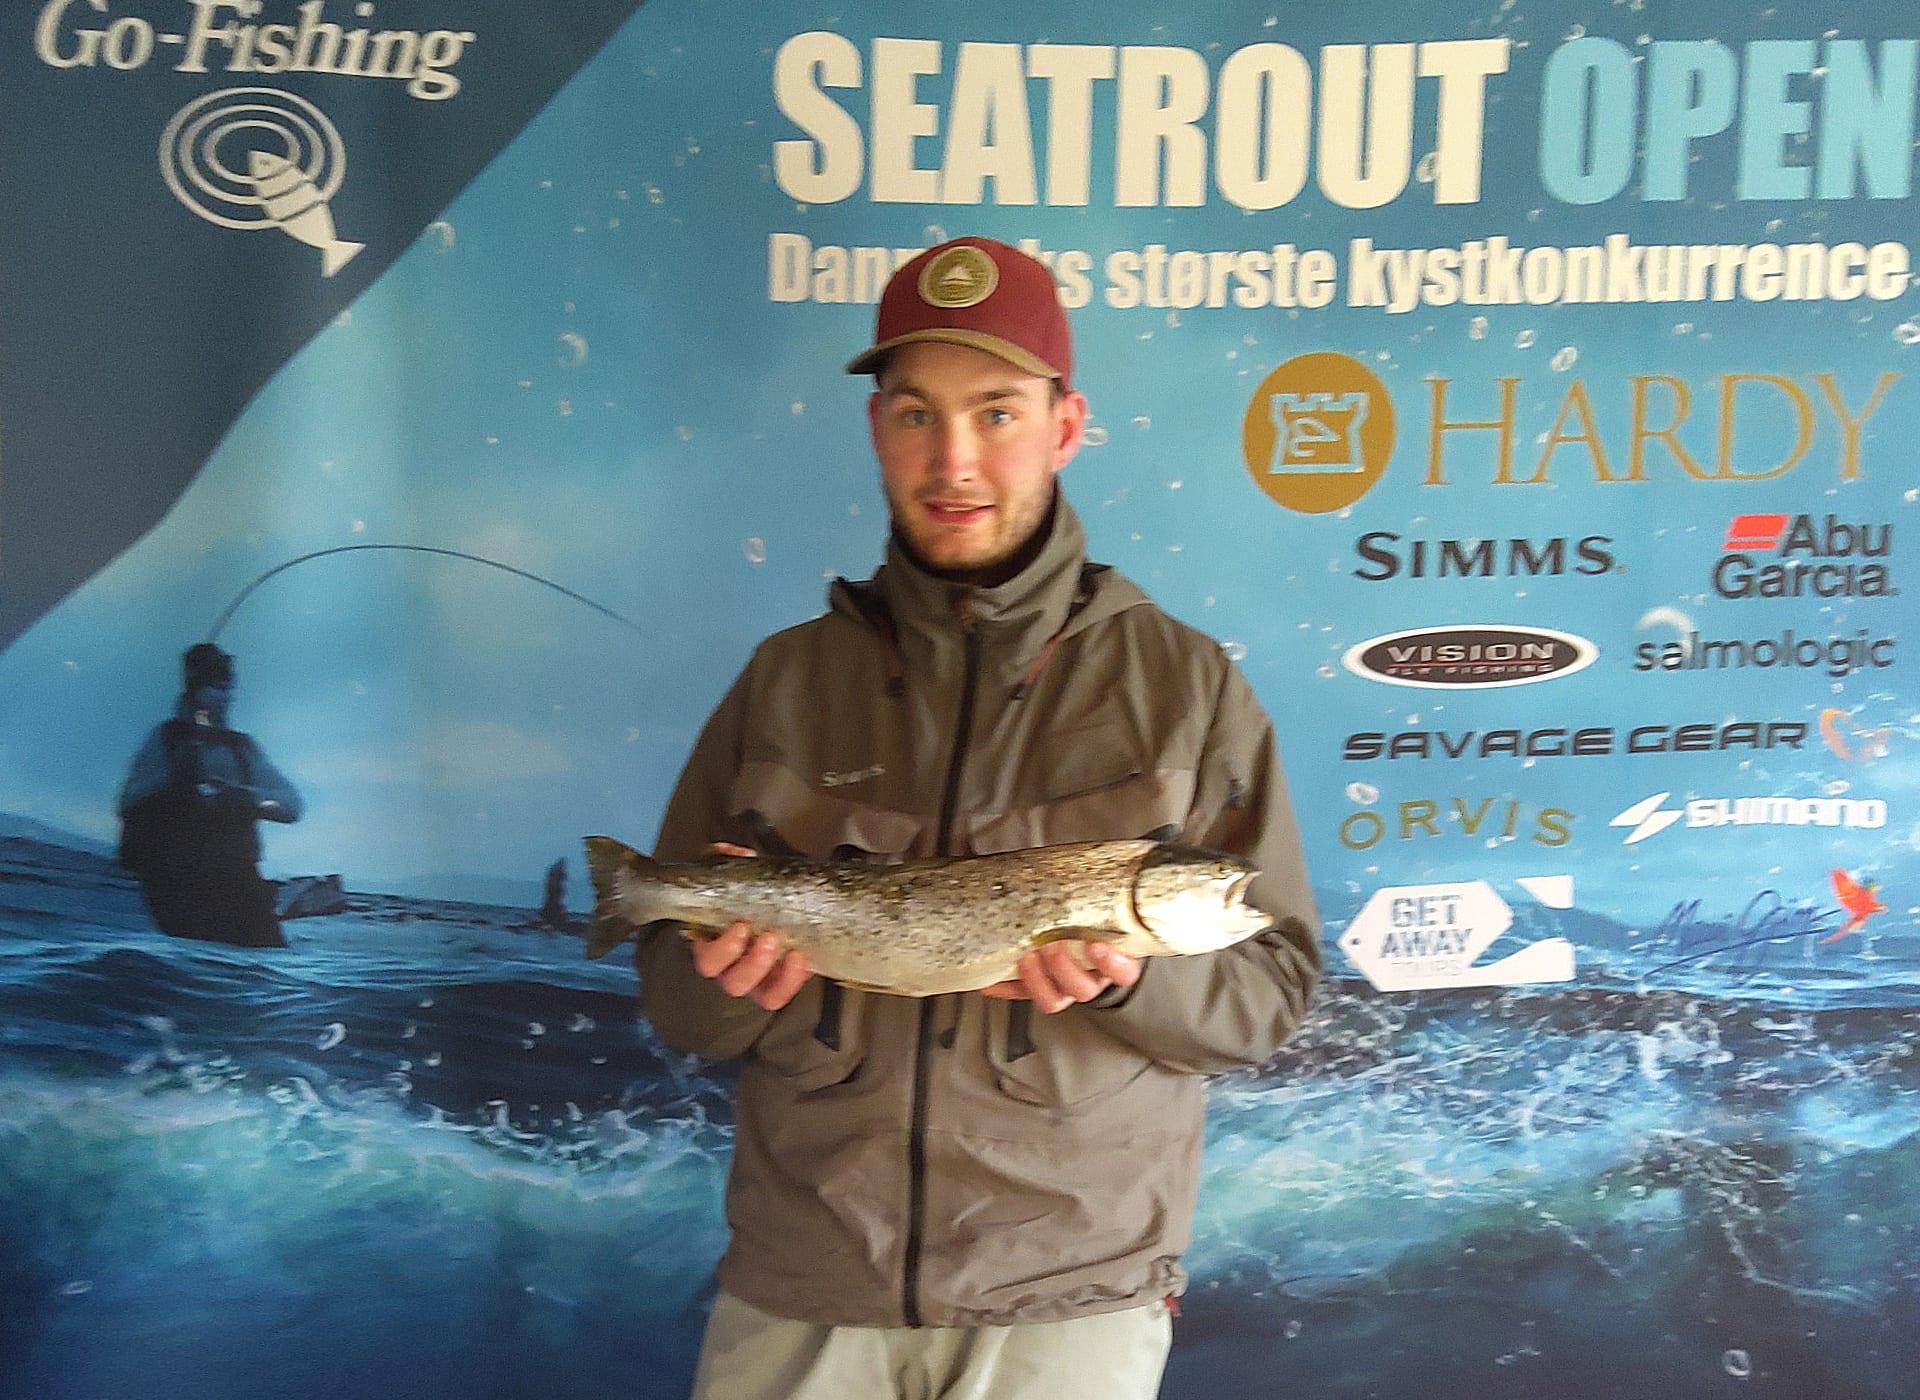 Seatrout Open deltager Jens Pedersen